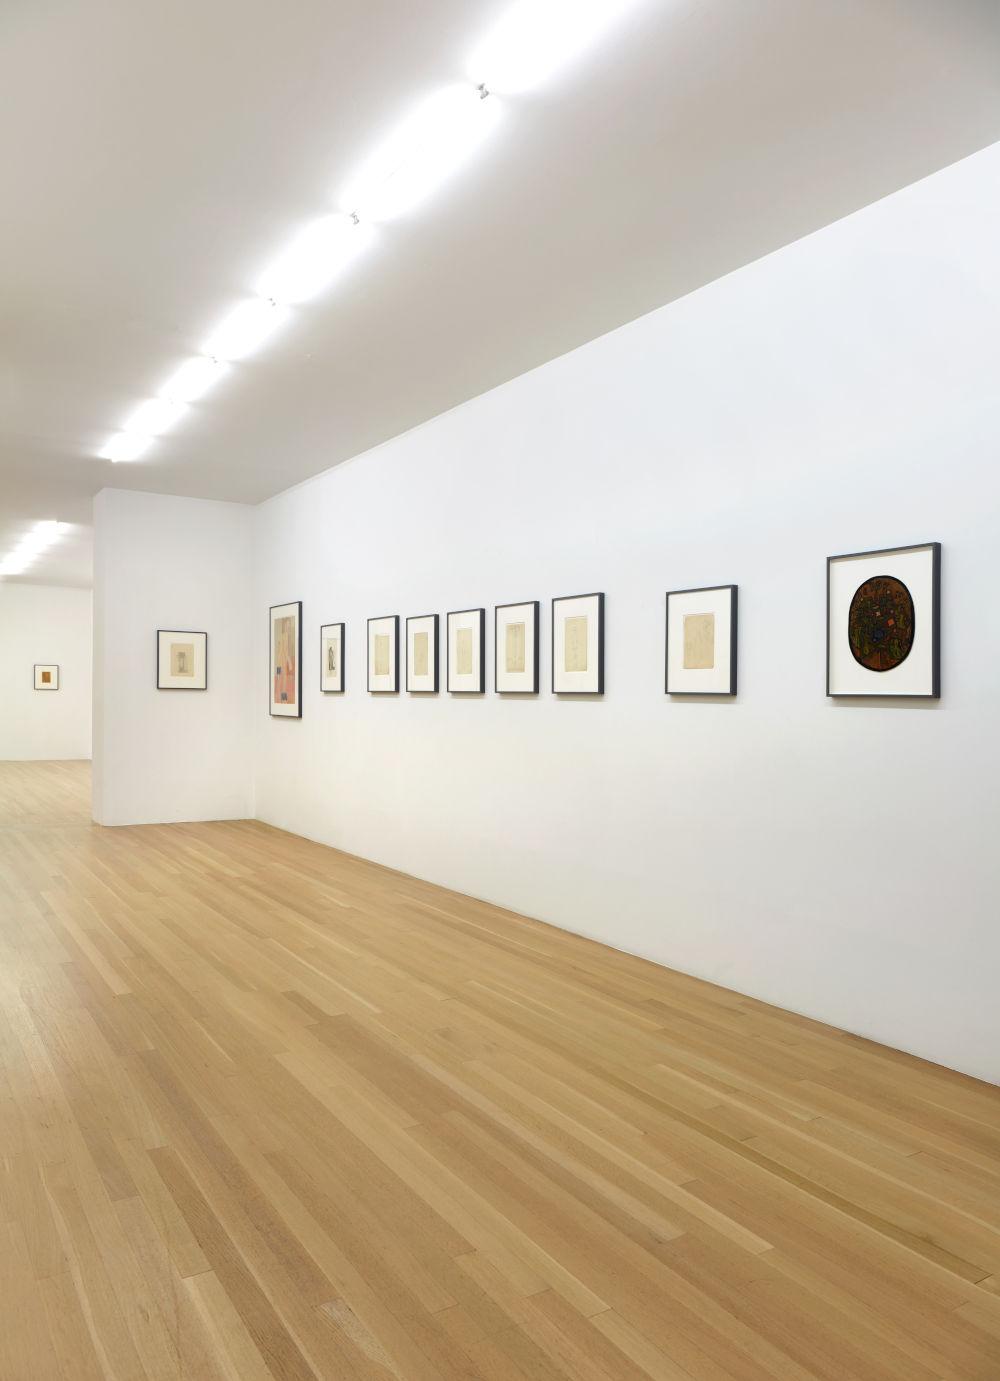 Galerie Buchholz Otto Meyer-Amden 2